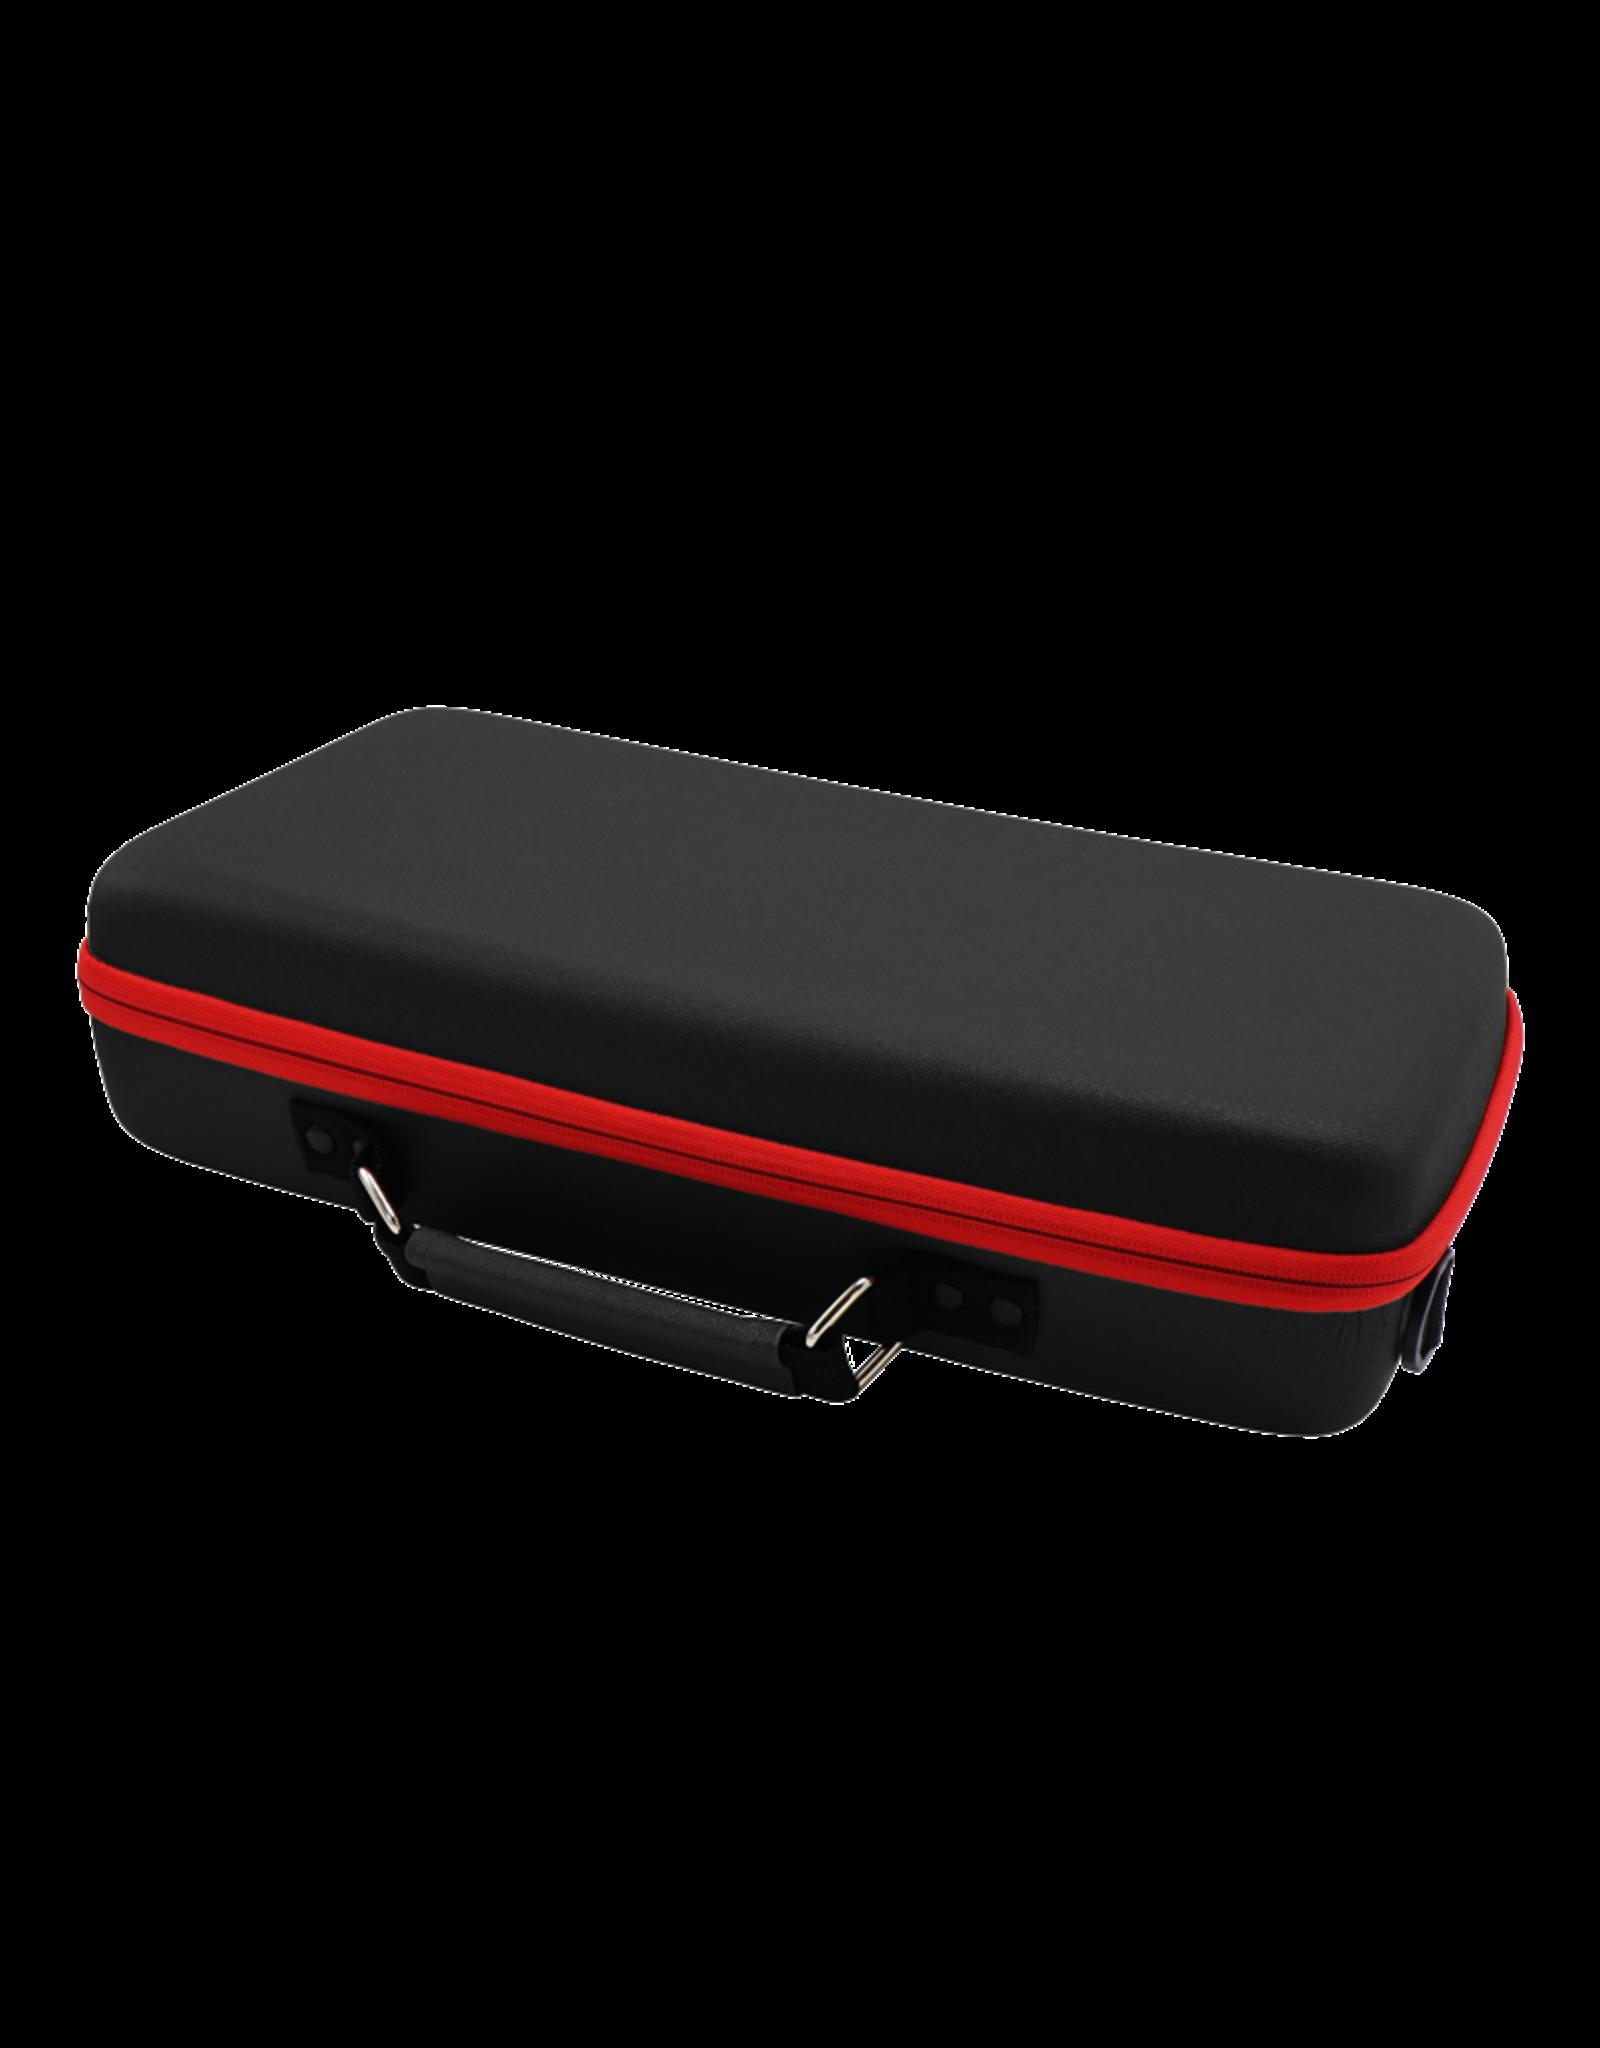 Dex Protection DEX Carrying Case Black